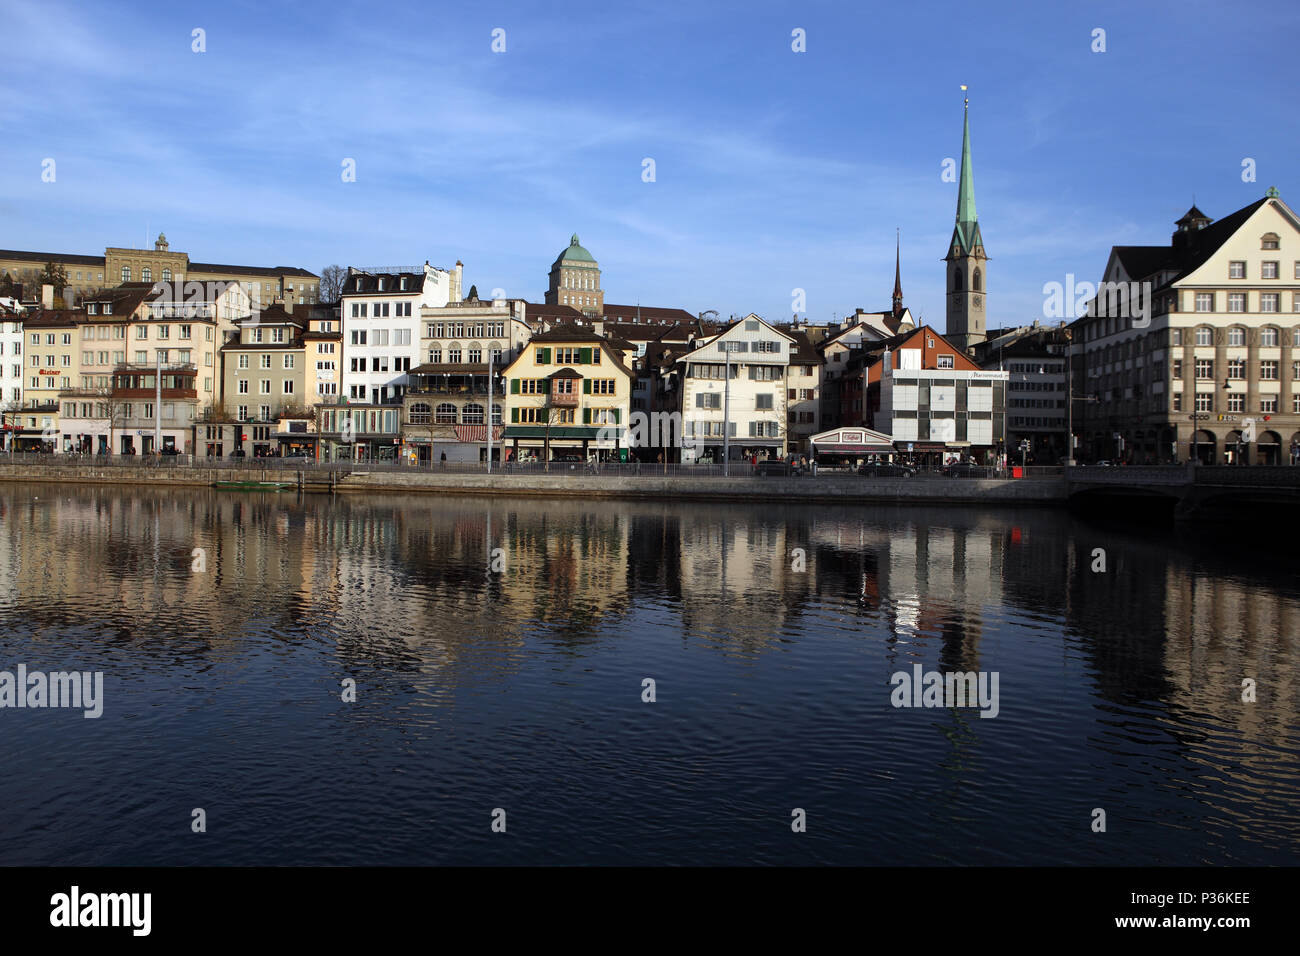 Zurich, Switzerland, city view on the Limmatquai - Stock Image